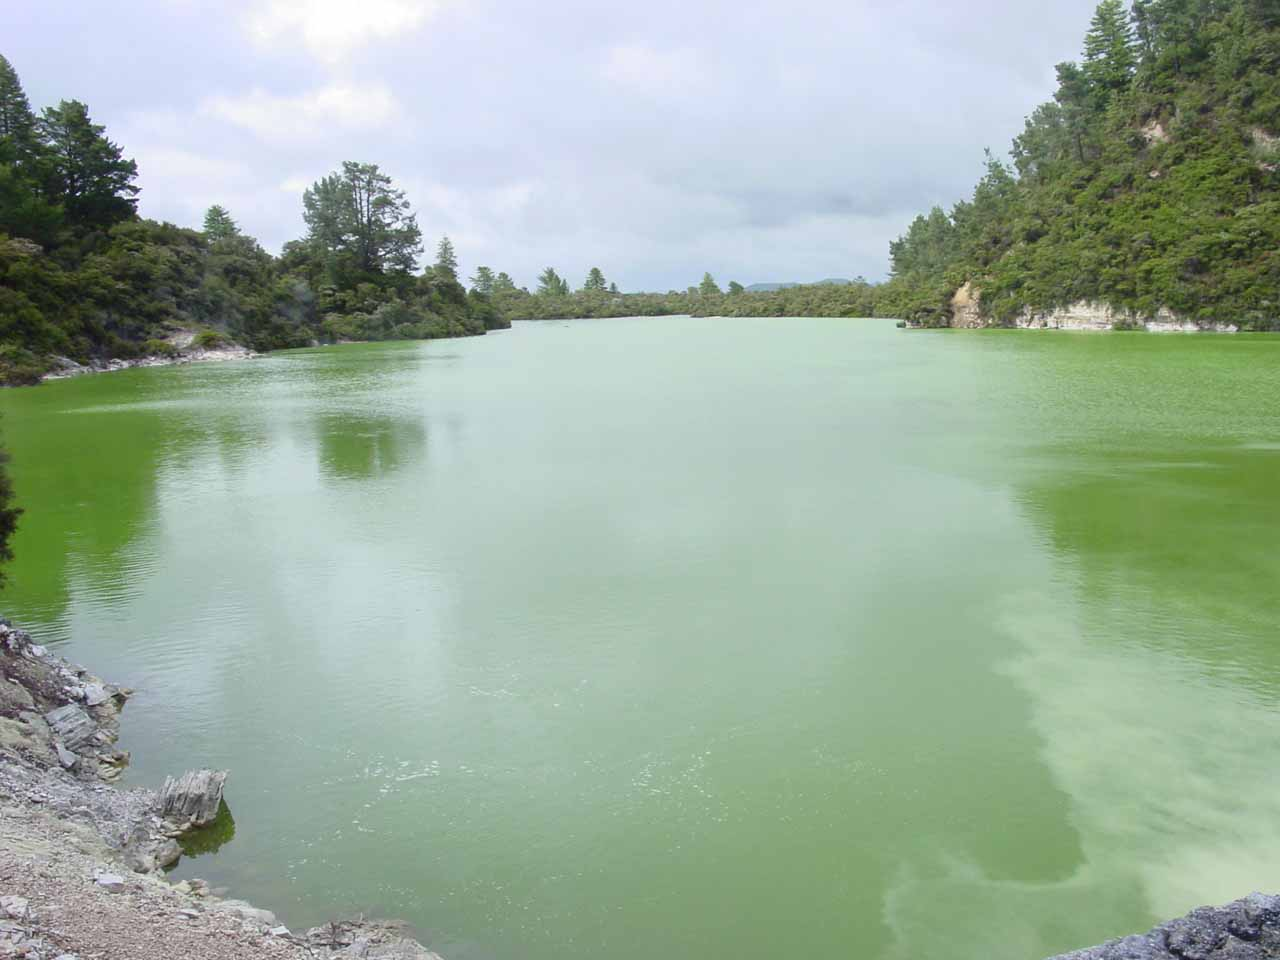 A menacingly calm Sulphur Lake